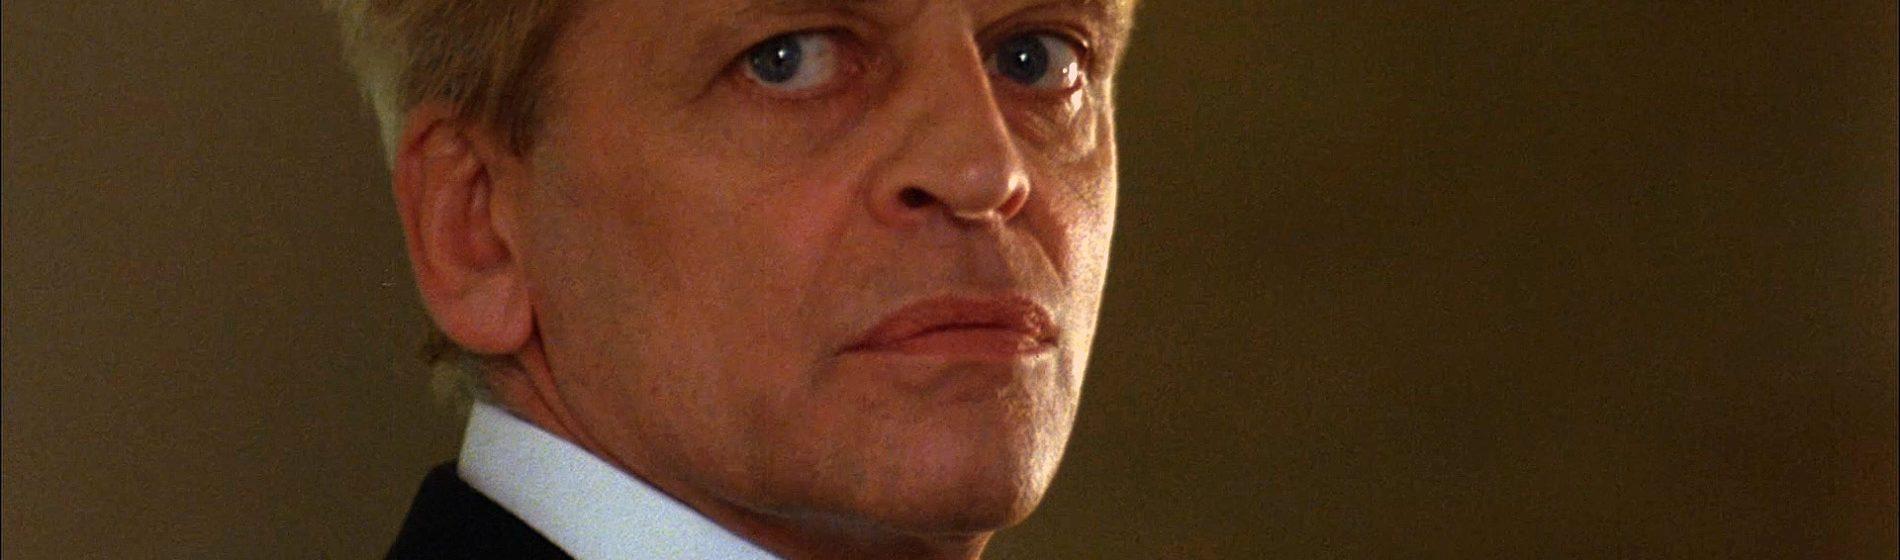 Schizoid (1980) Klaus Kinski